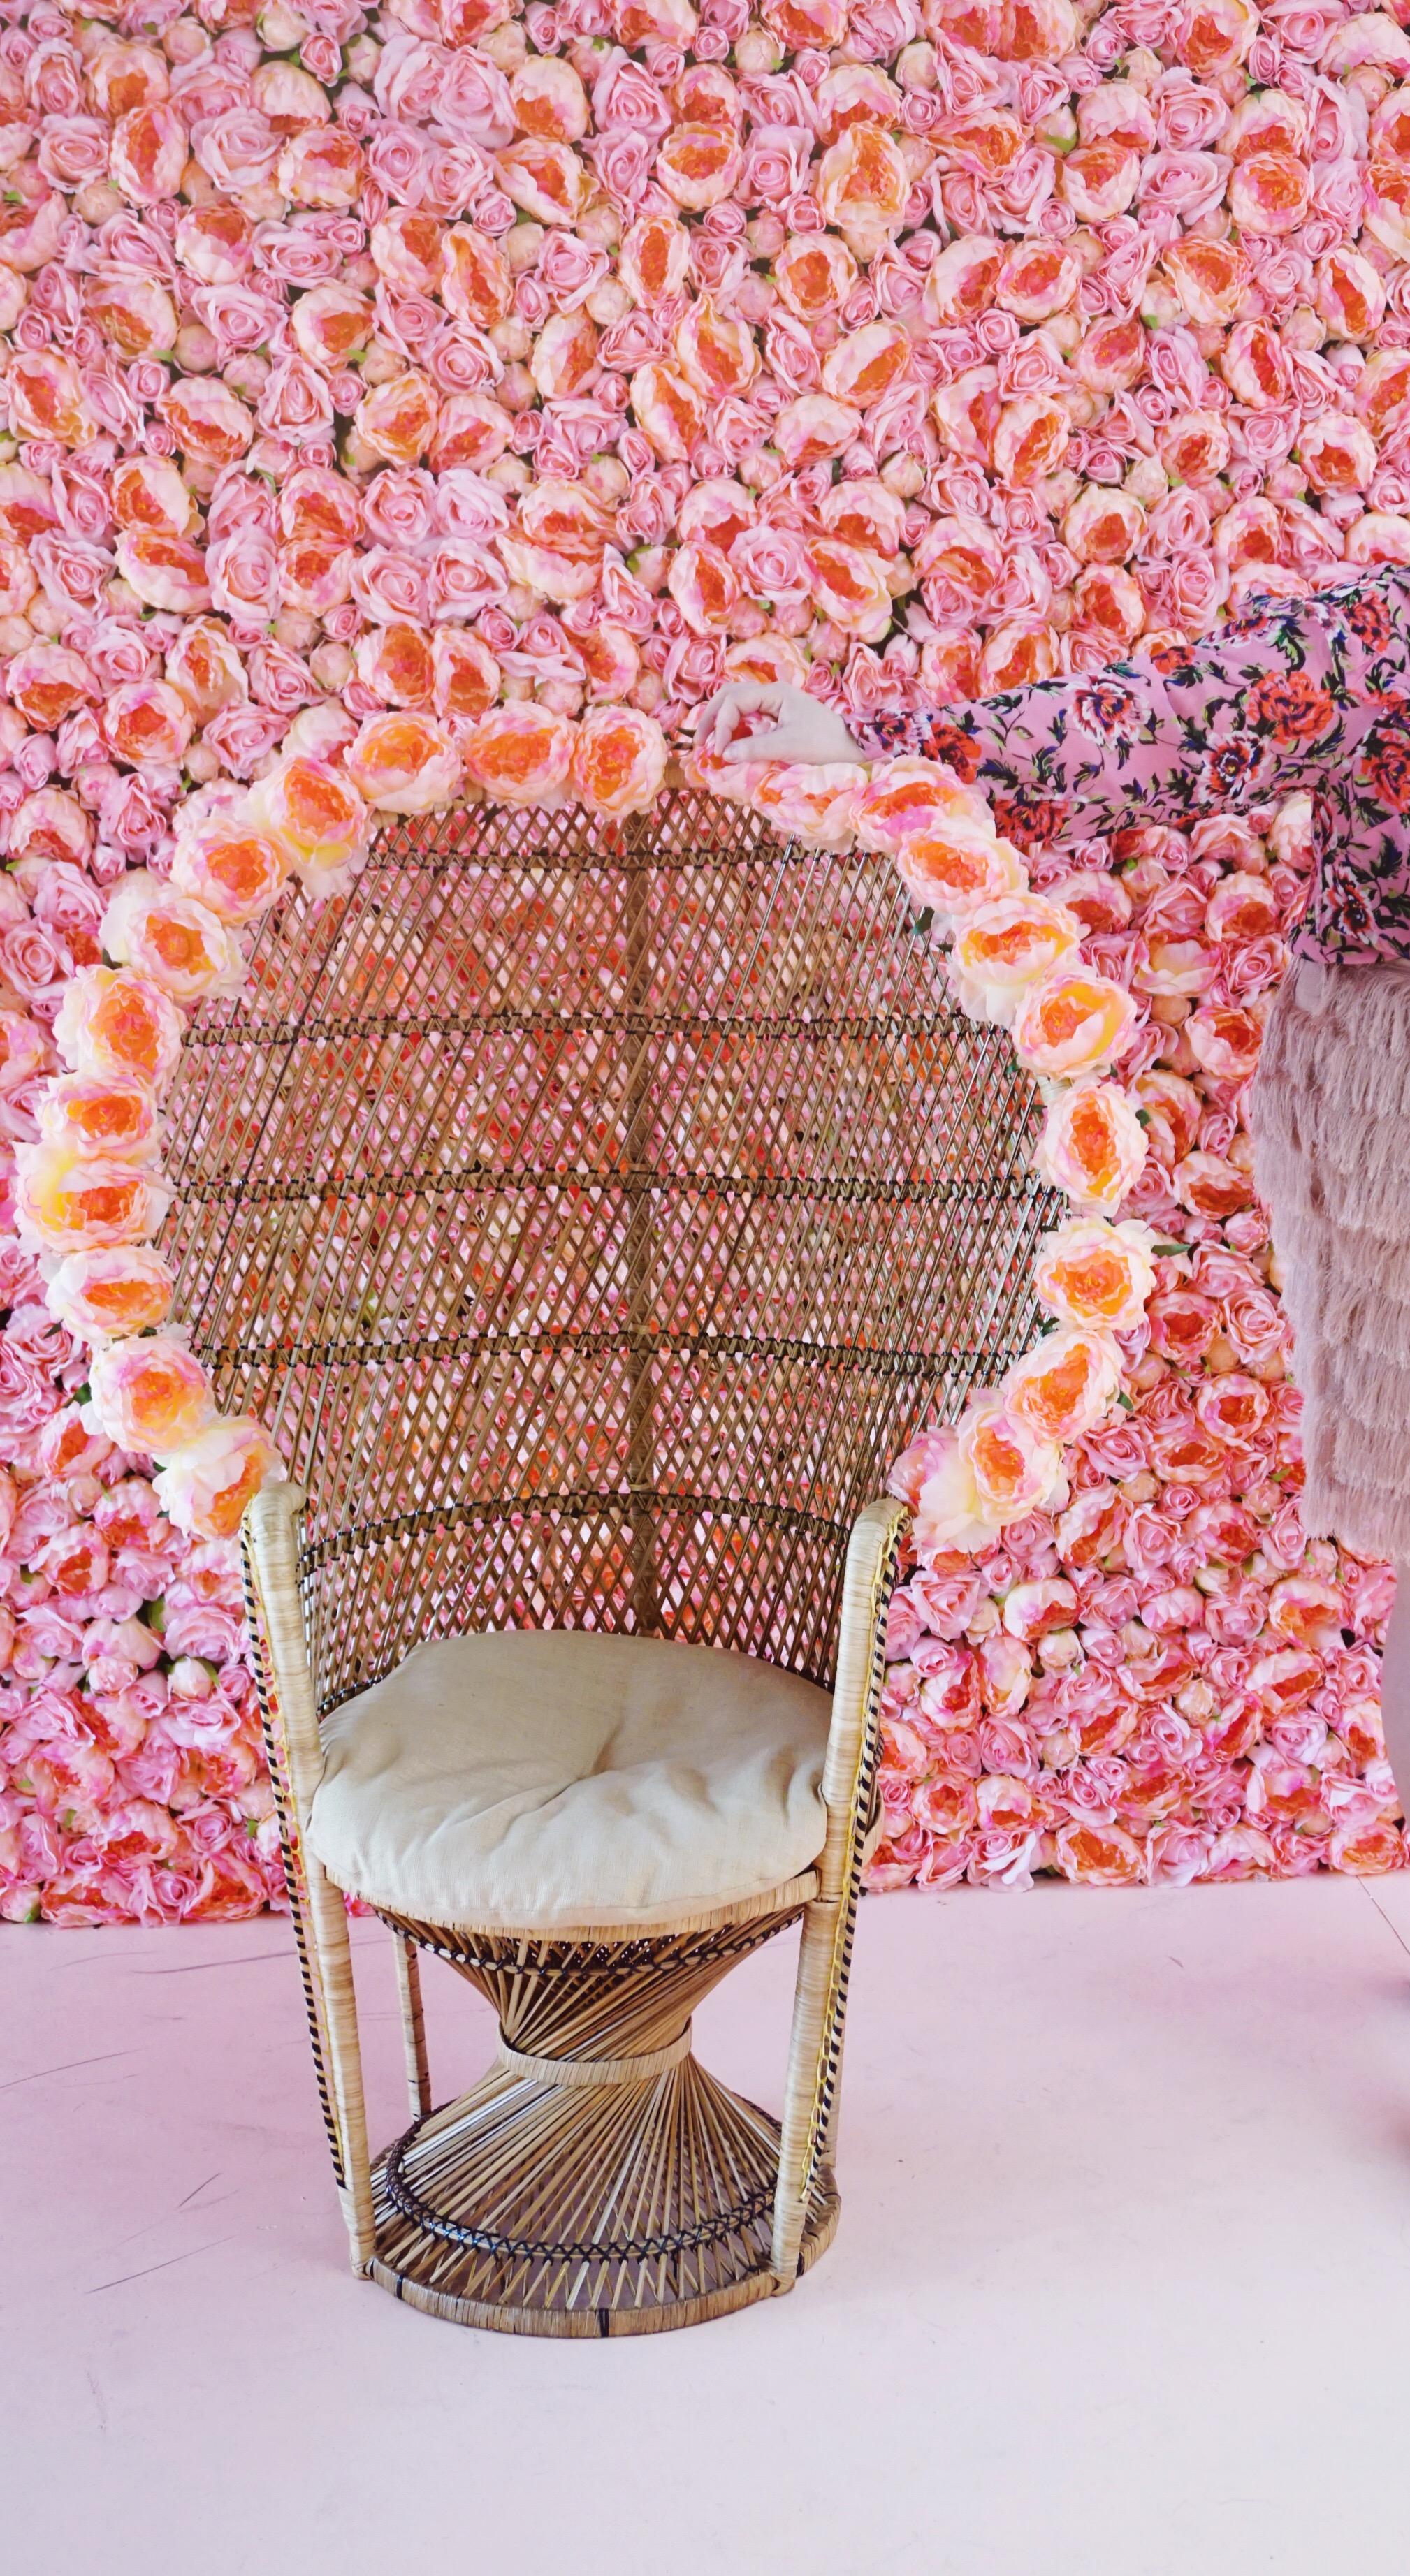 chair flower vault.jpg